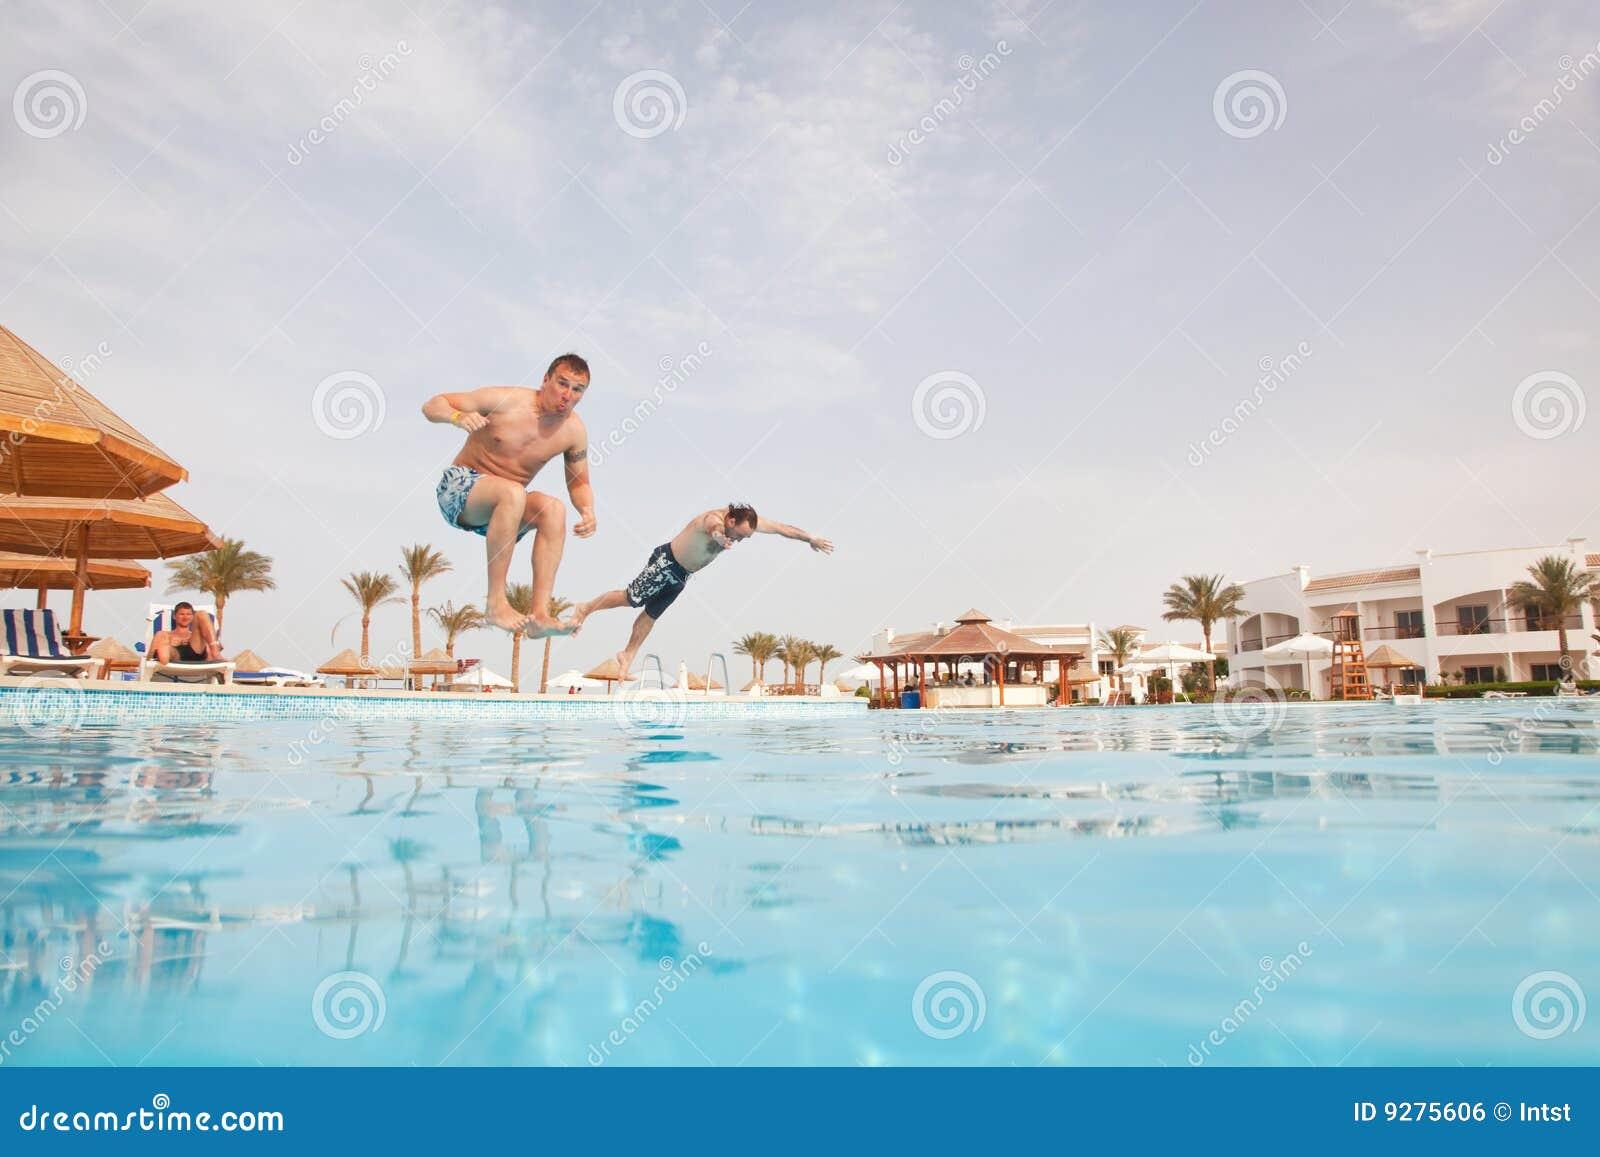 Dos hombres que se divierten en la piscina imagen de archivo libre de regal as imagen 9275606 - Business plan piscina ...